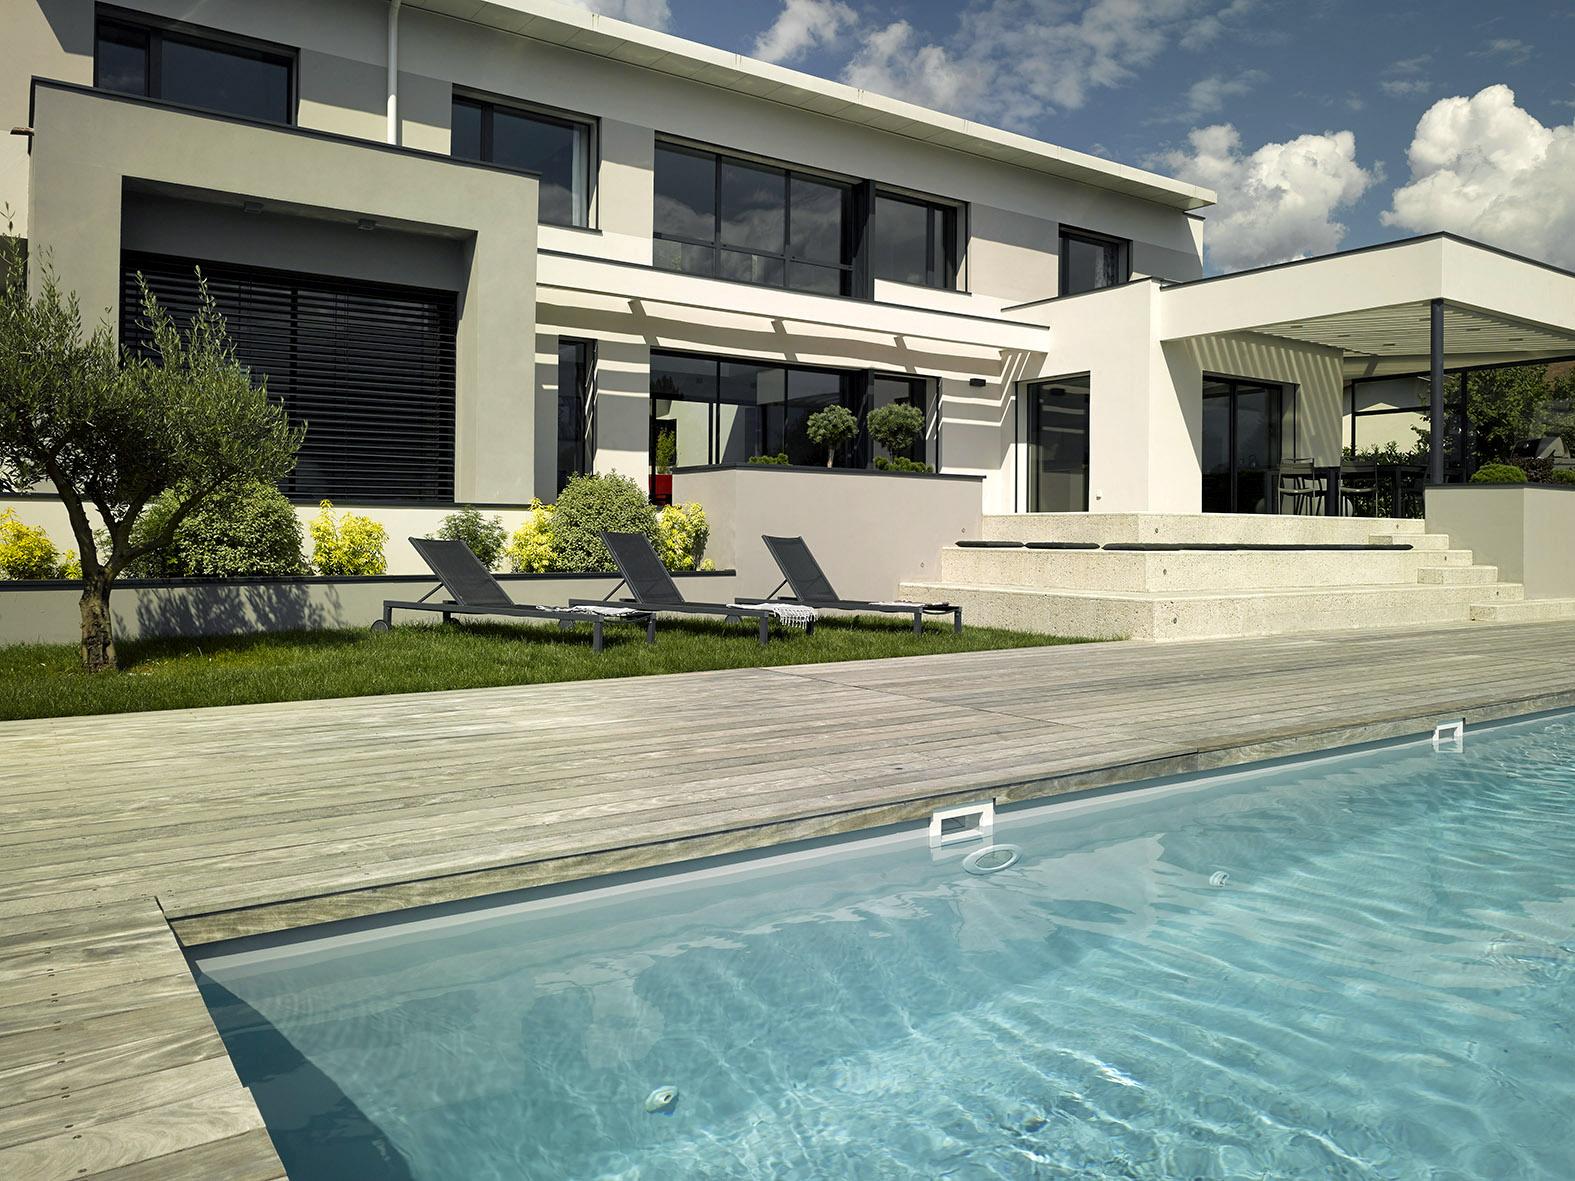 concessionnaire piscines carre bleu adonis paysages. Black Bedroom Furniture Sets. Home Design Ideas